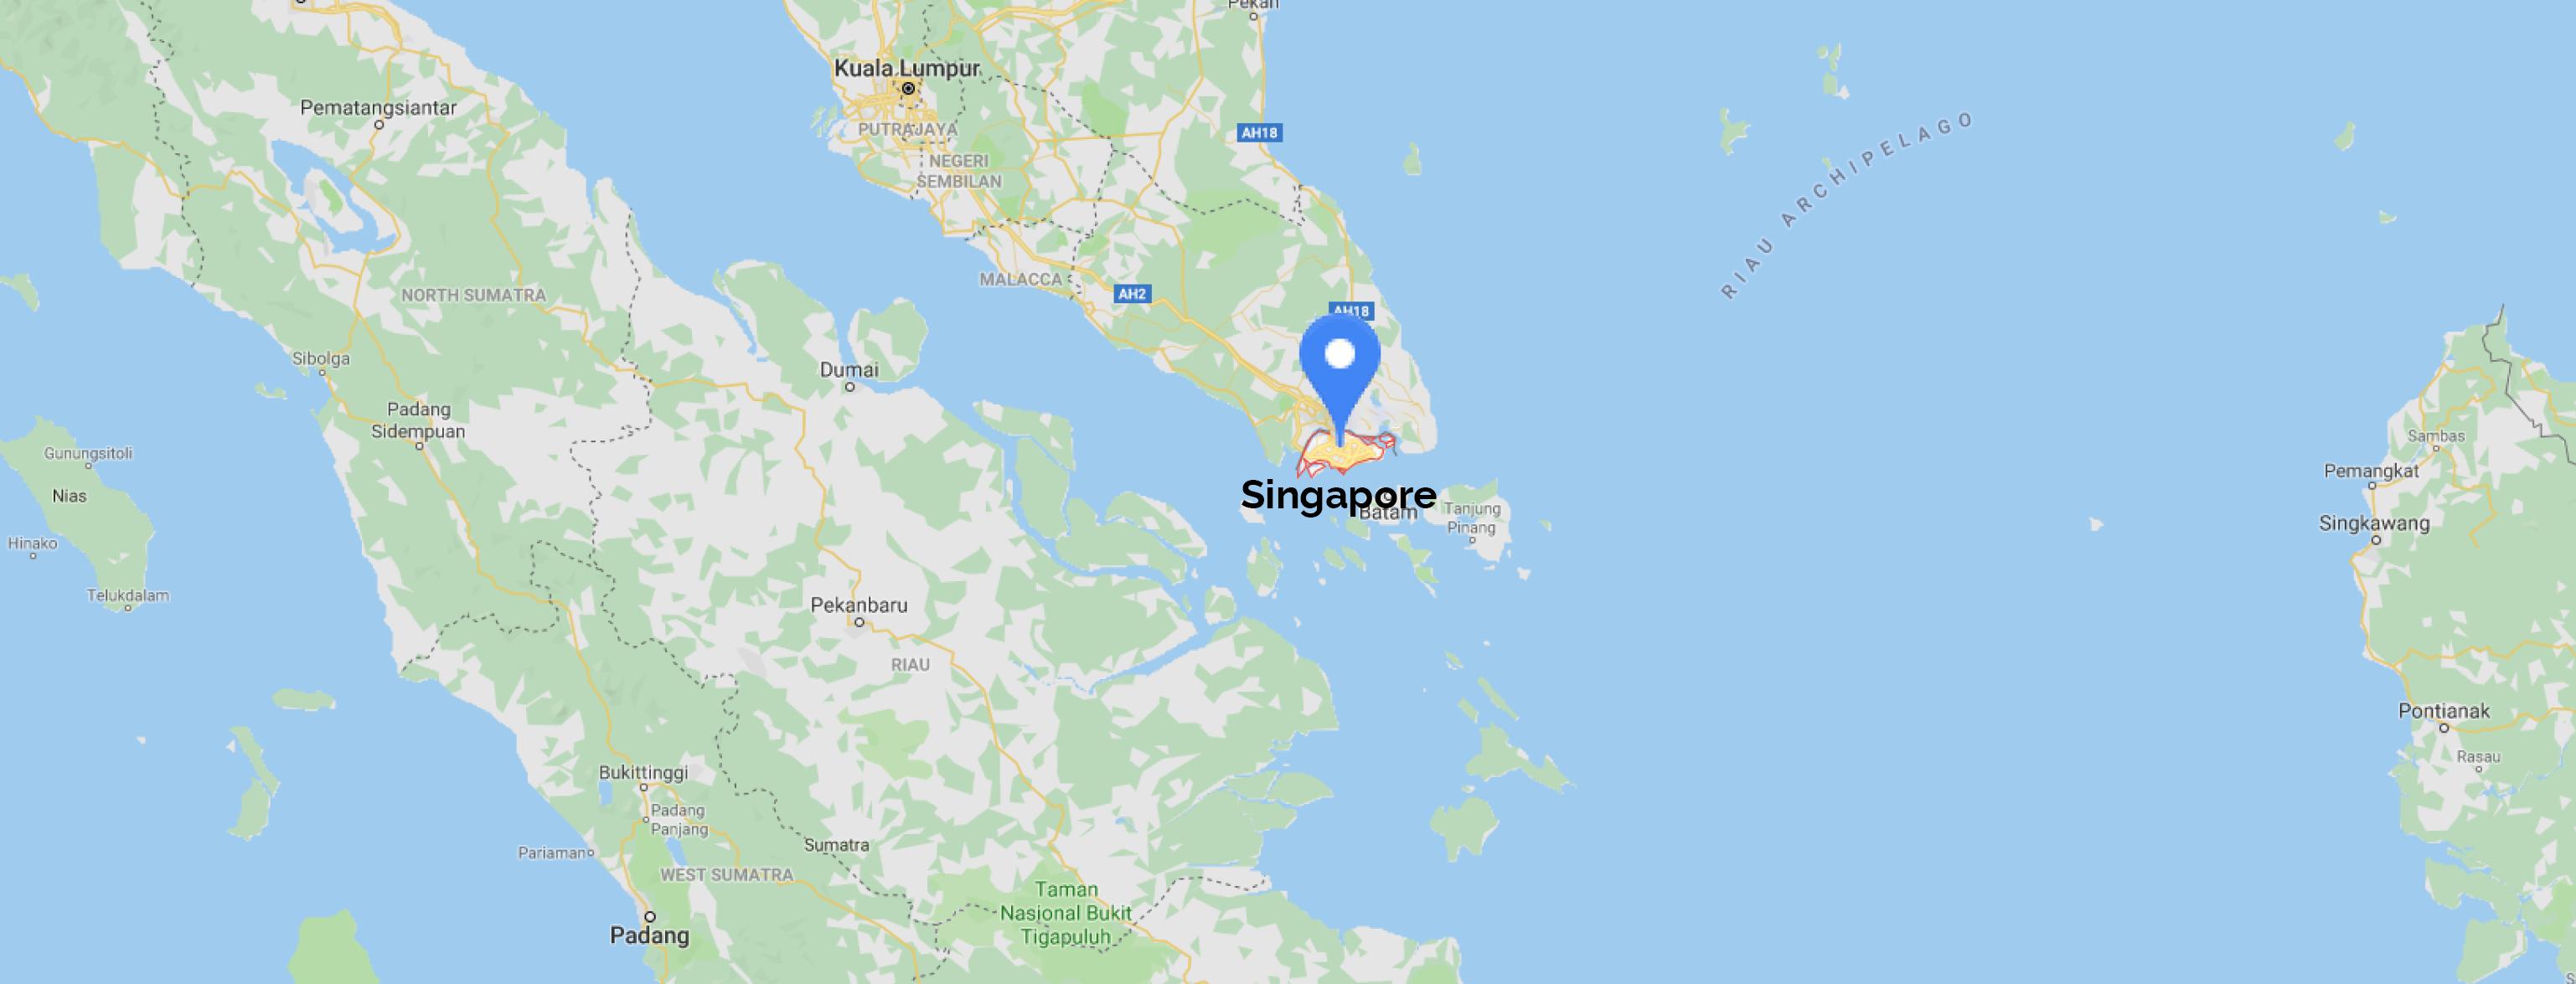 singapore map